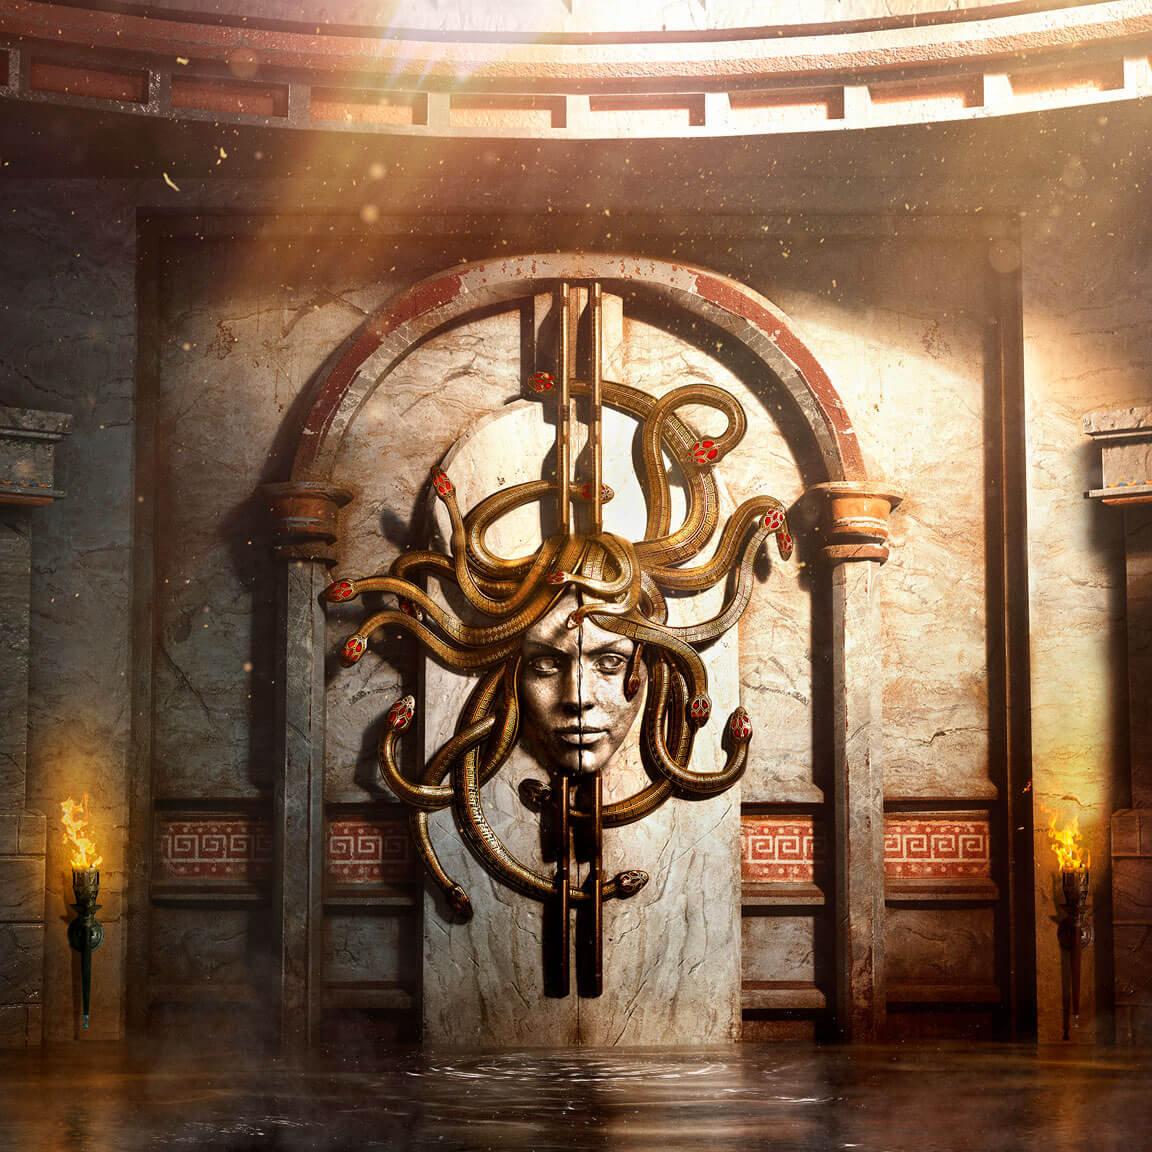 Beyond Medusas Gate